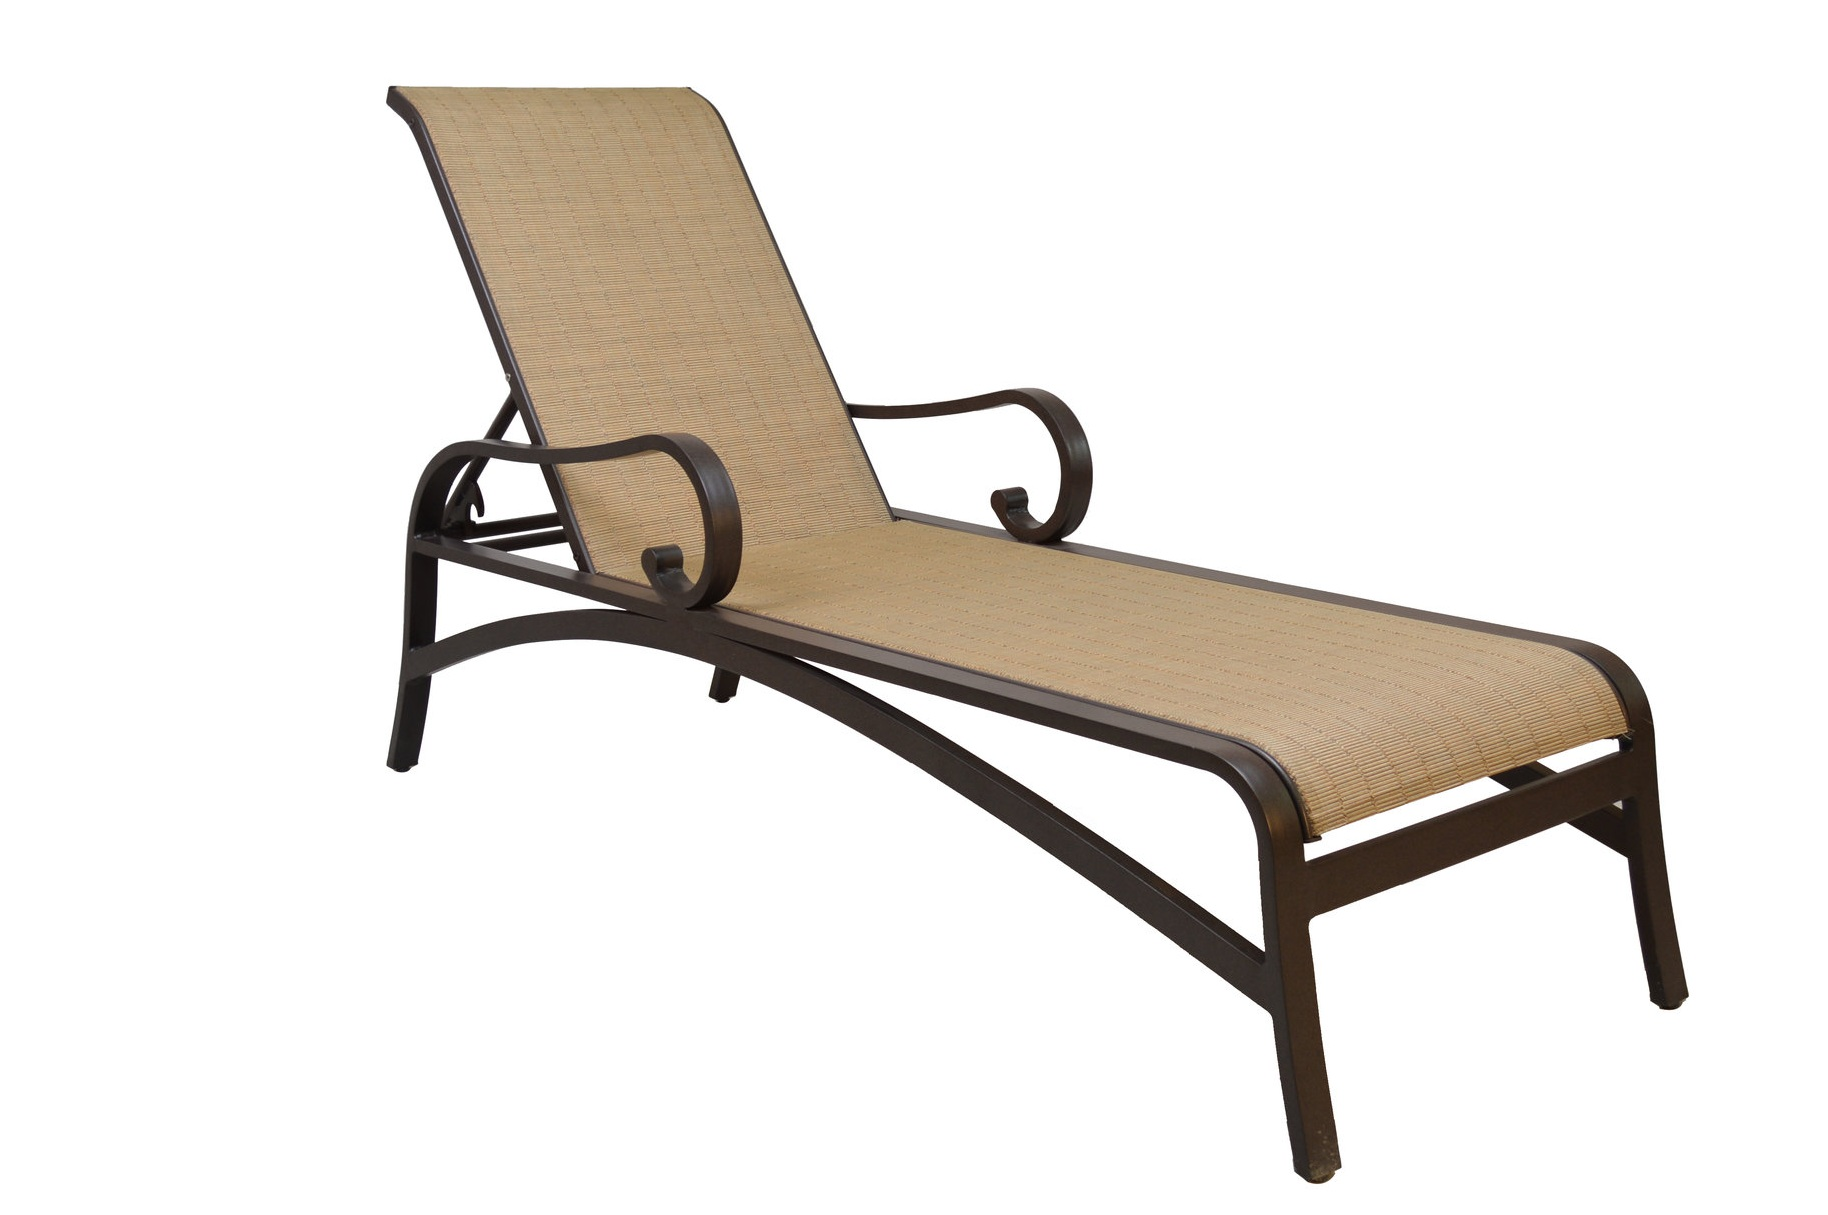 601551 Key Largo Adjustable Chaise   25 x 83.6 x 23.4